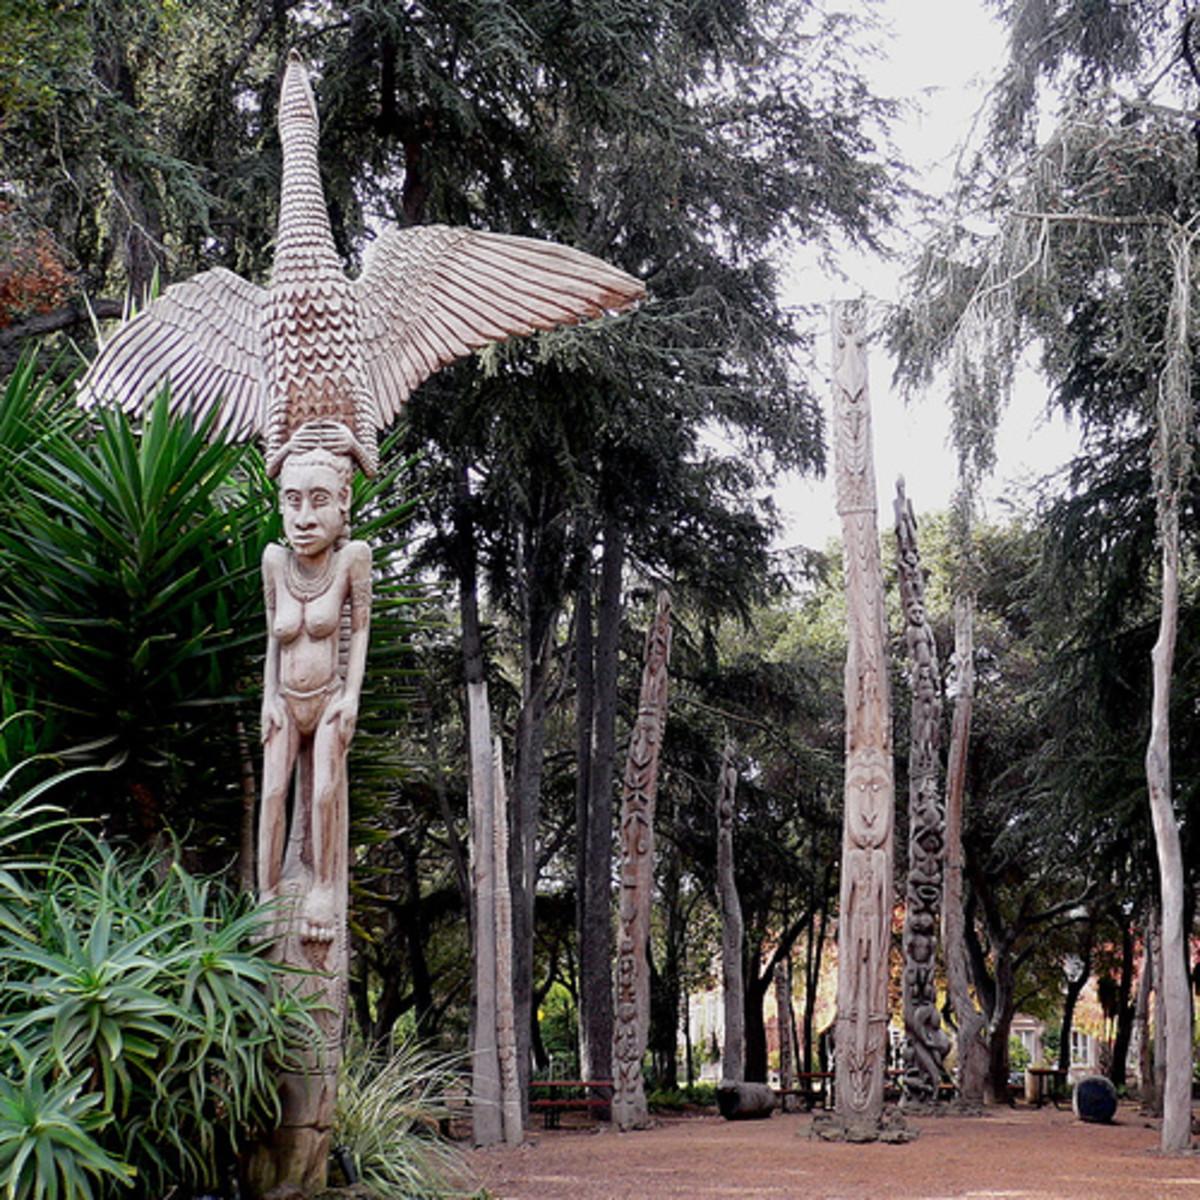 Totem Poles Before 1700 AD Around the Pacific Rim